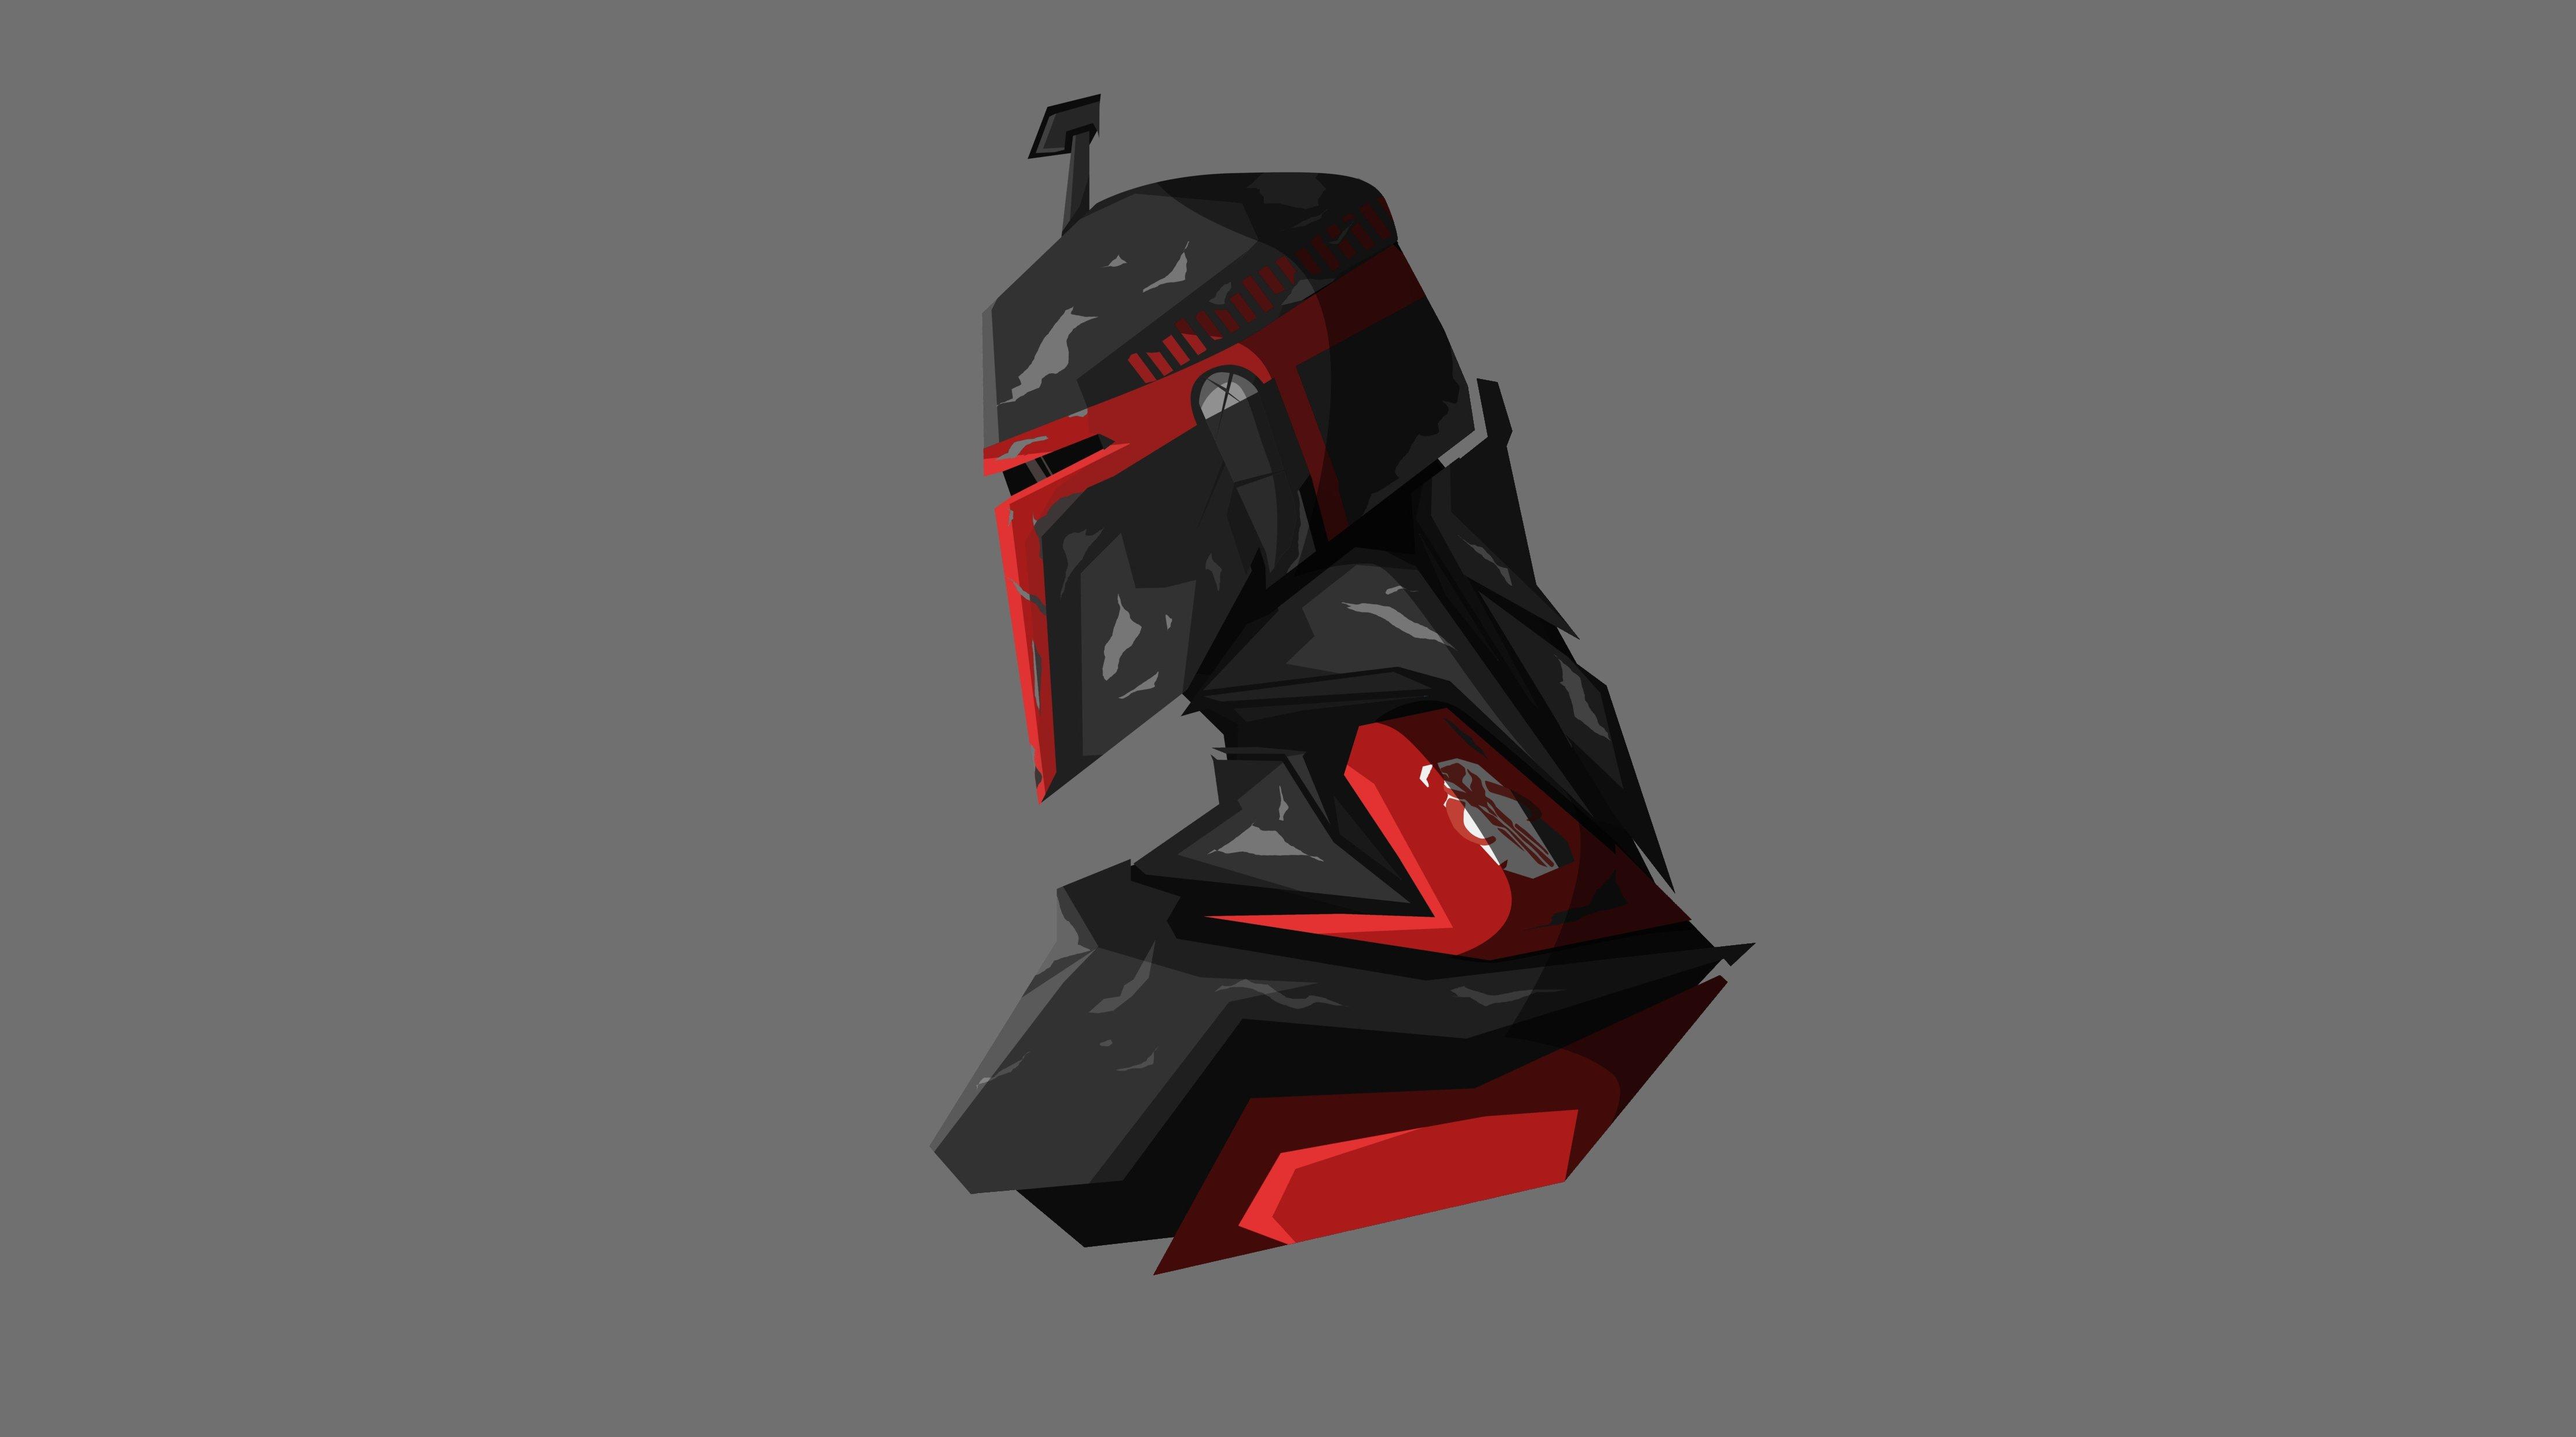 Fondos de pantalla Boba Fett Star Wars Ilustración